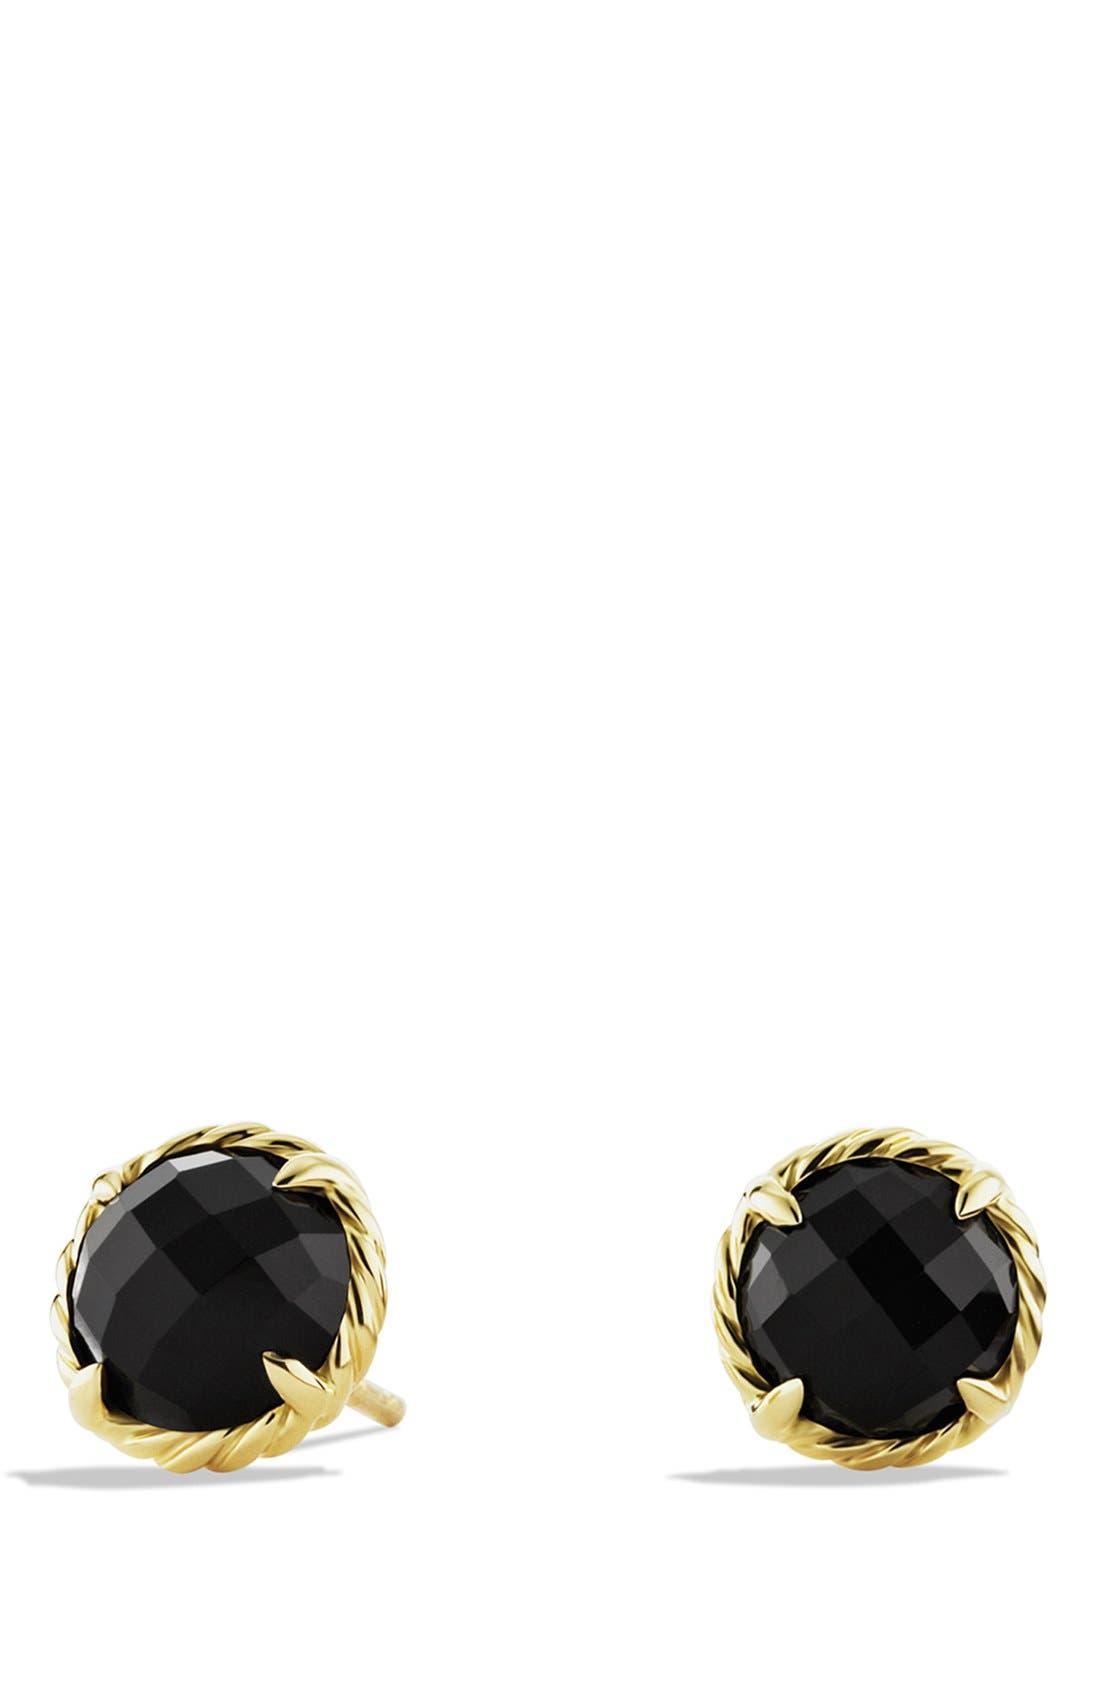 'Châtelaine' Earrings,                             Main thumbnail 1, color,                             BLACK ONYX